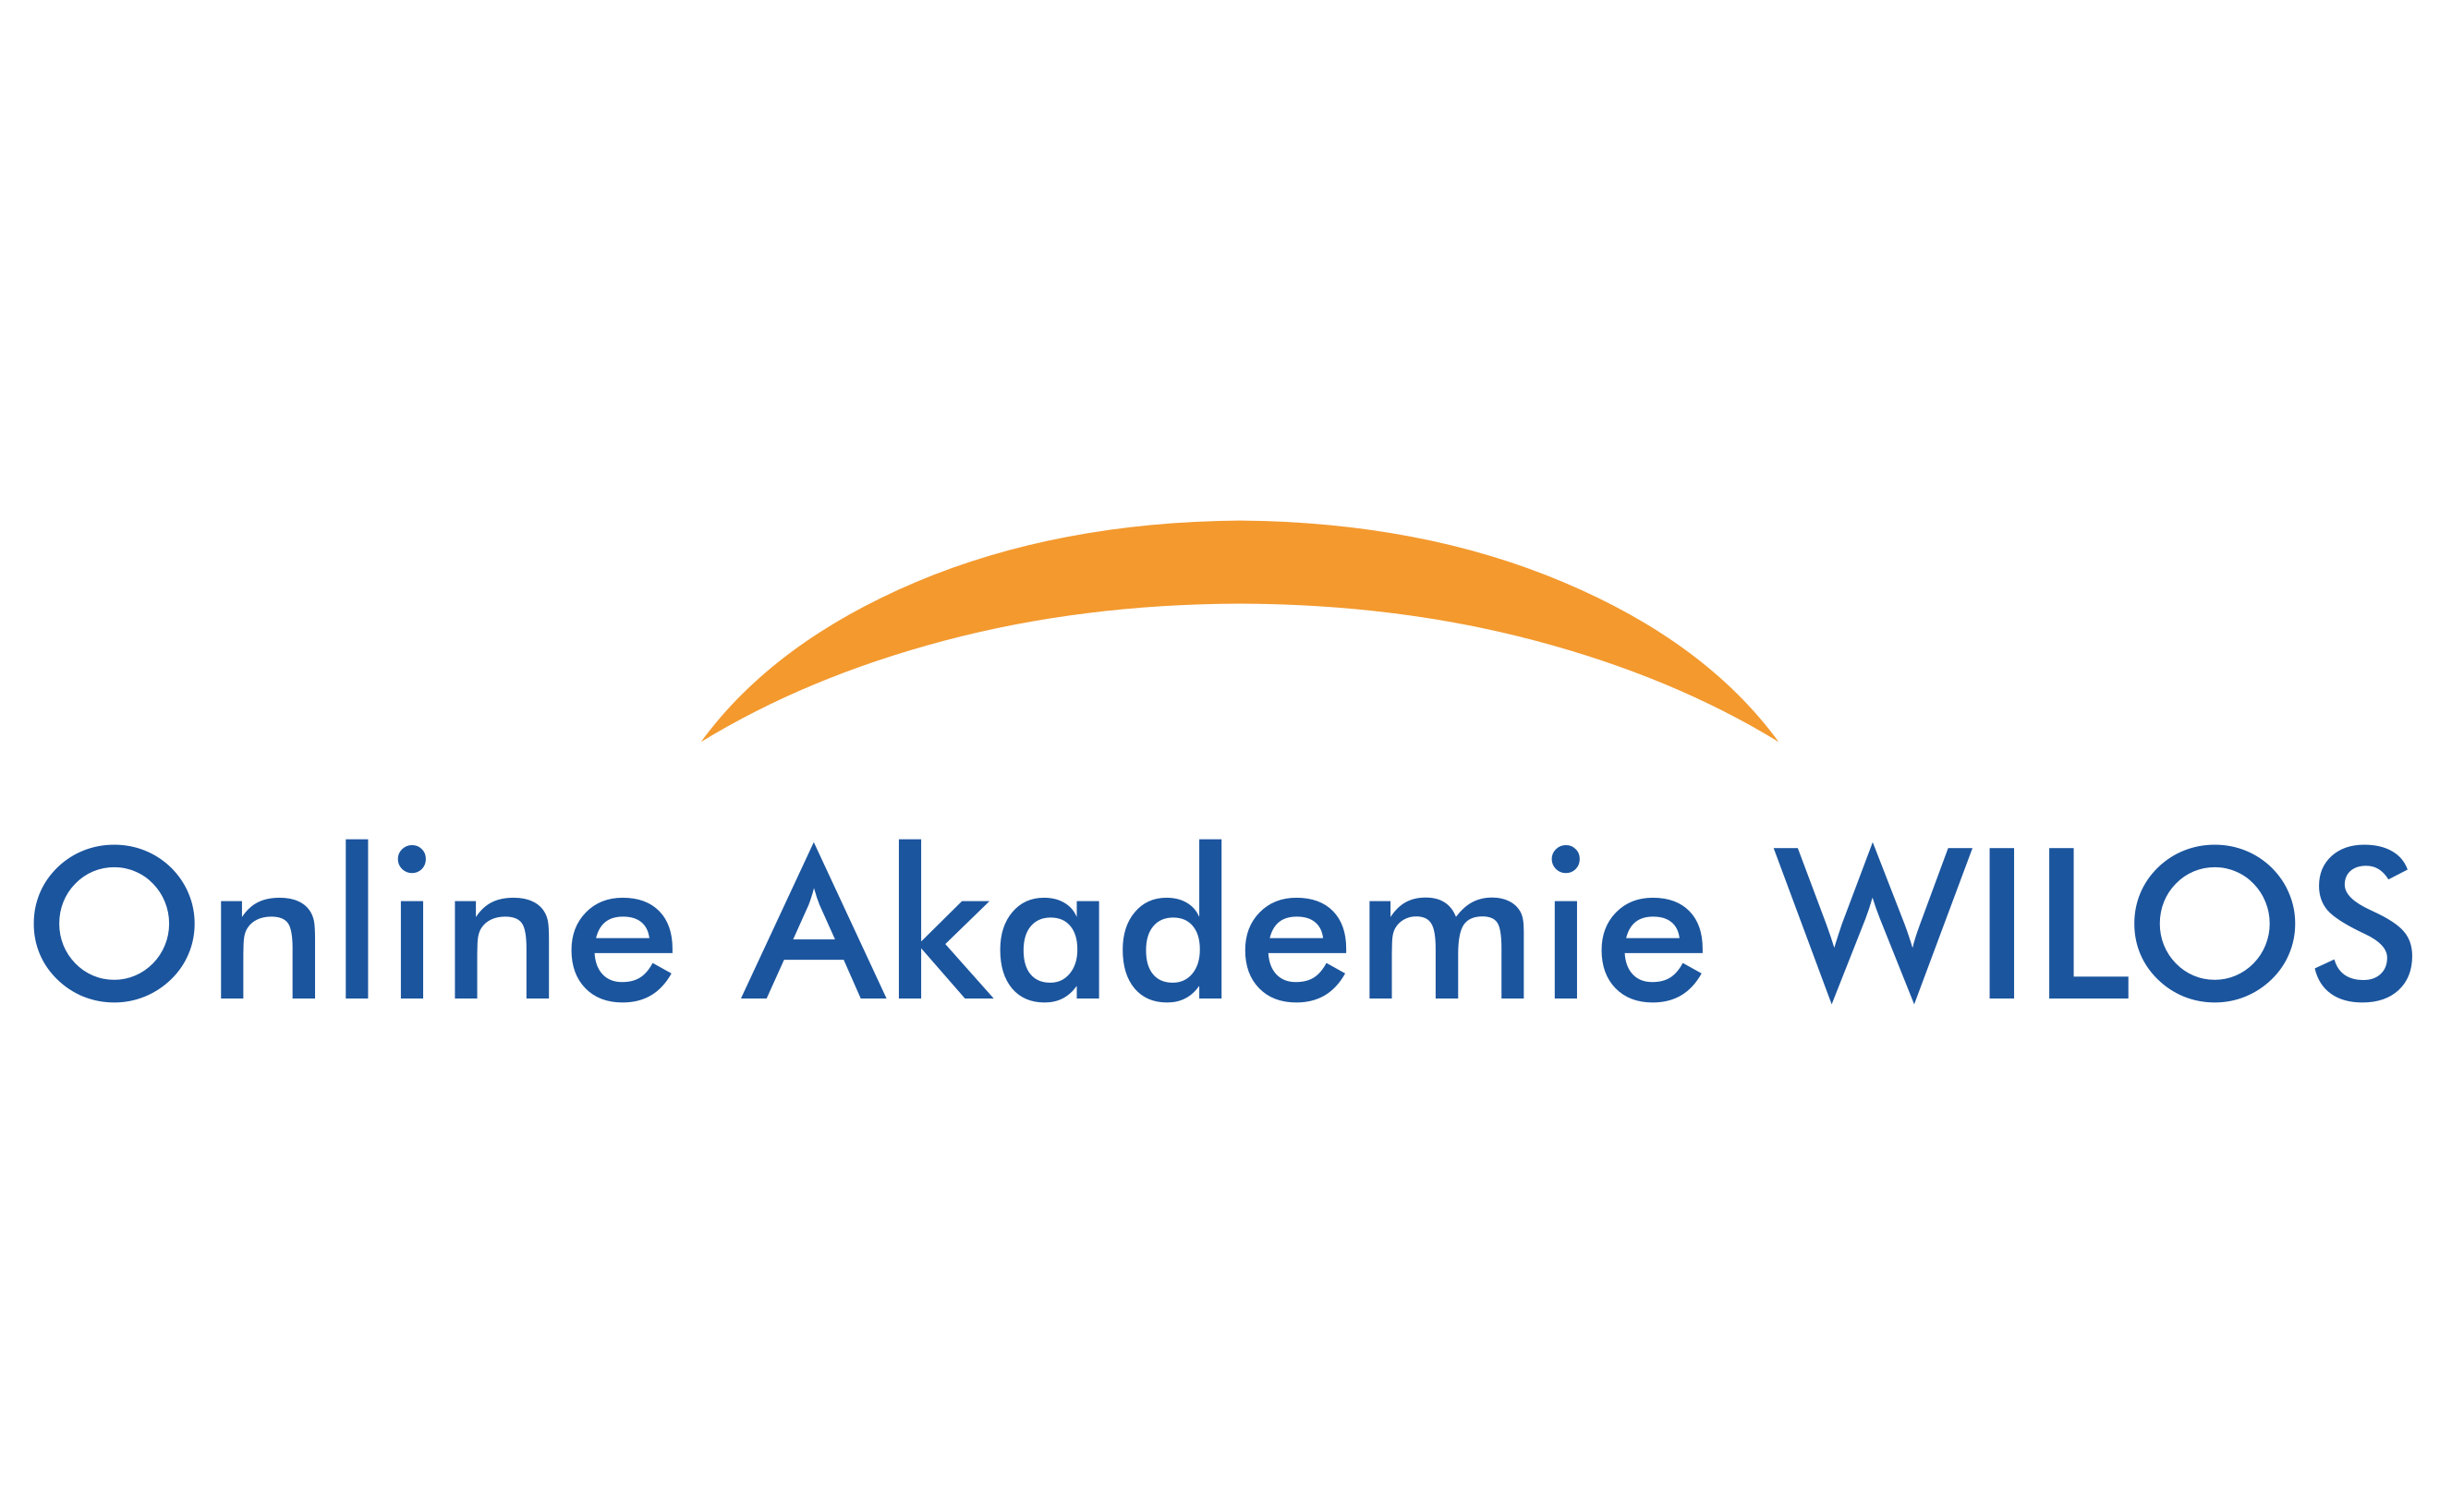 online-akademie-wilos